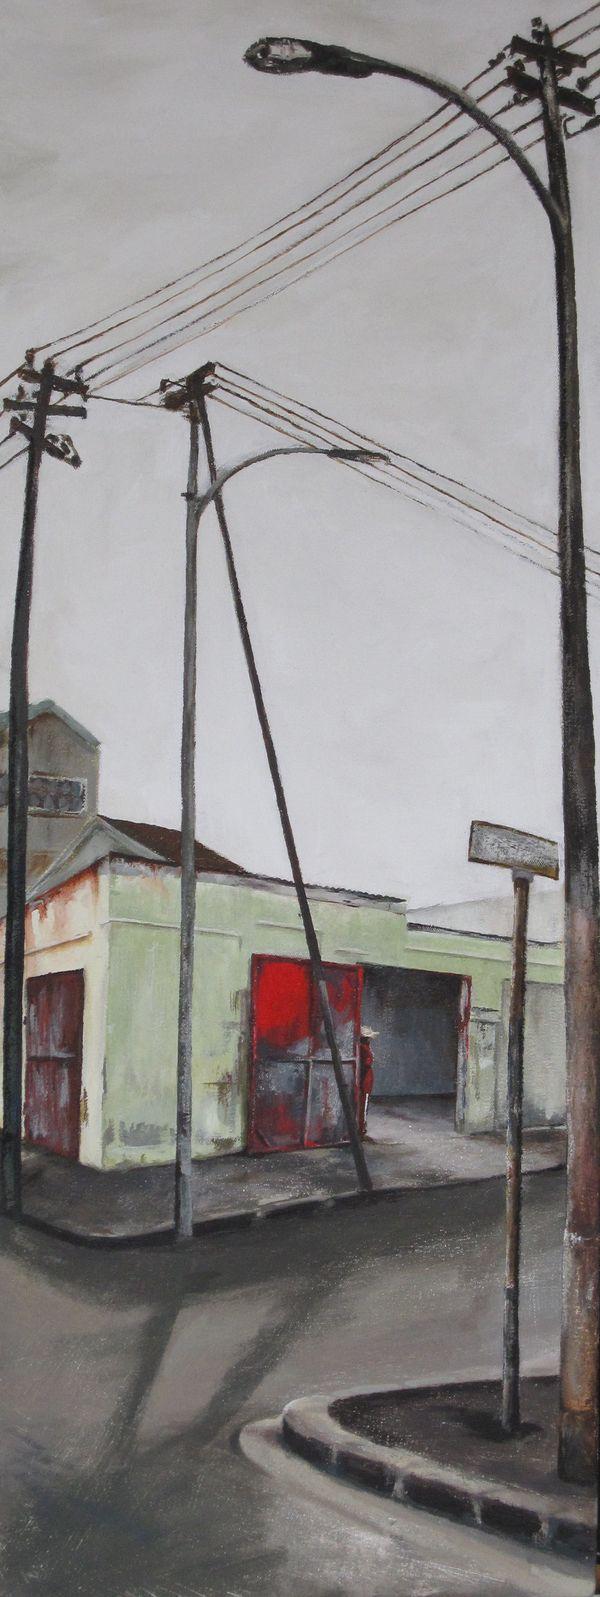 Panel Beaters Acrylic On Canvas 80 X 38 Cm 2009